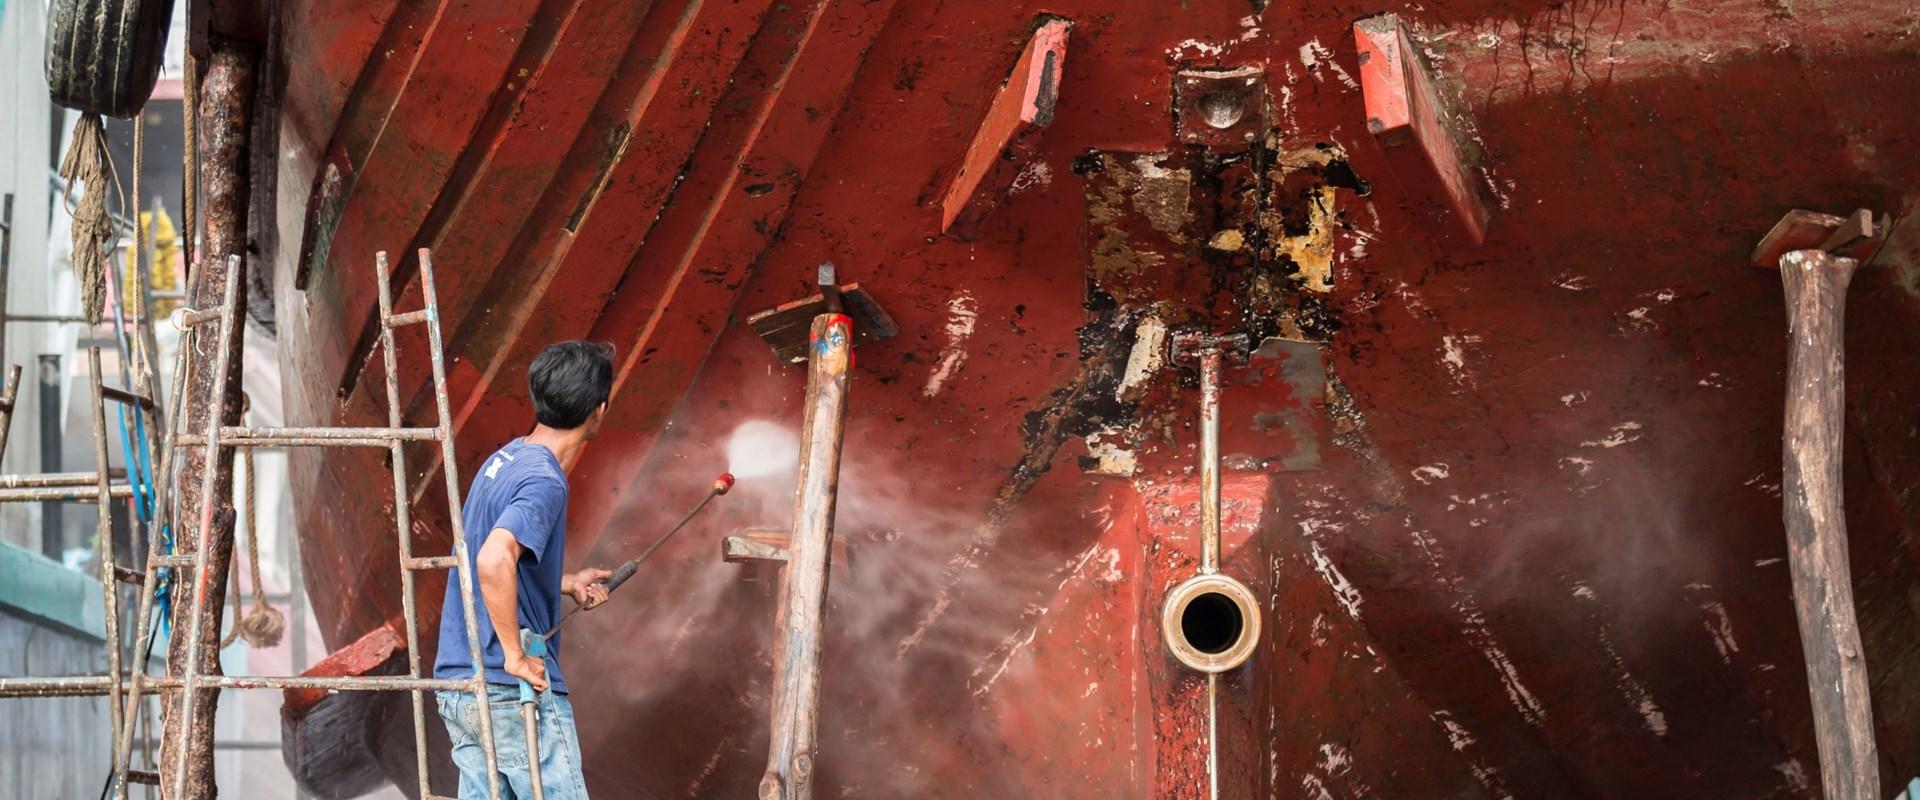 Claims ship repair yard